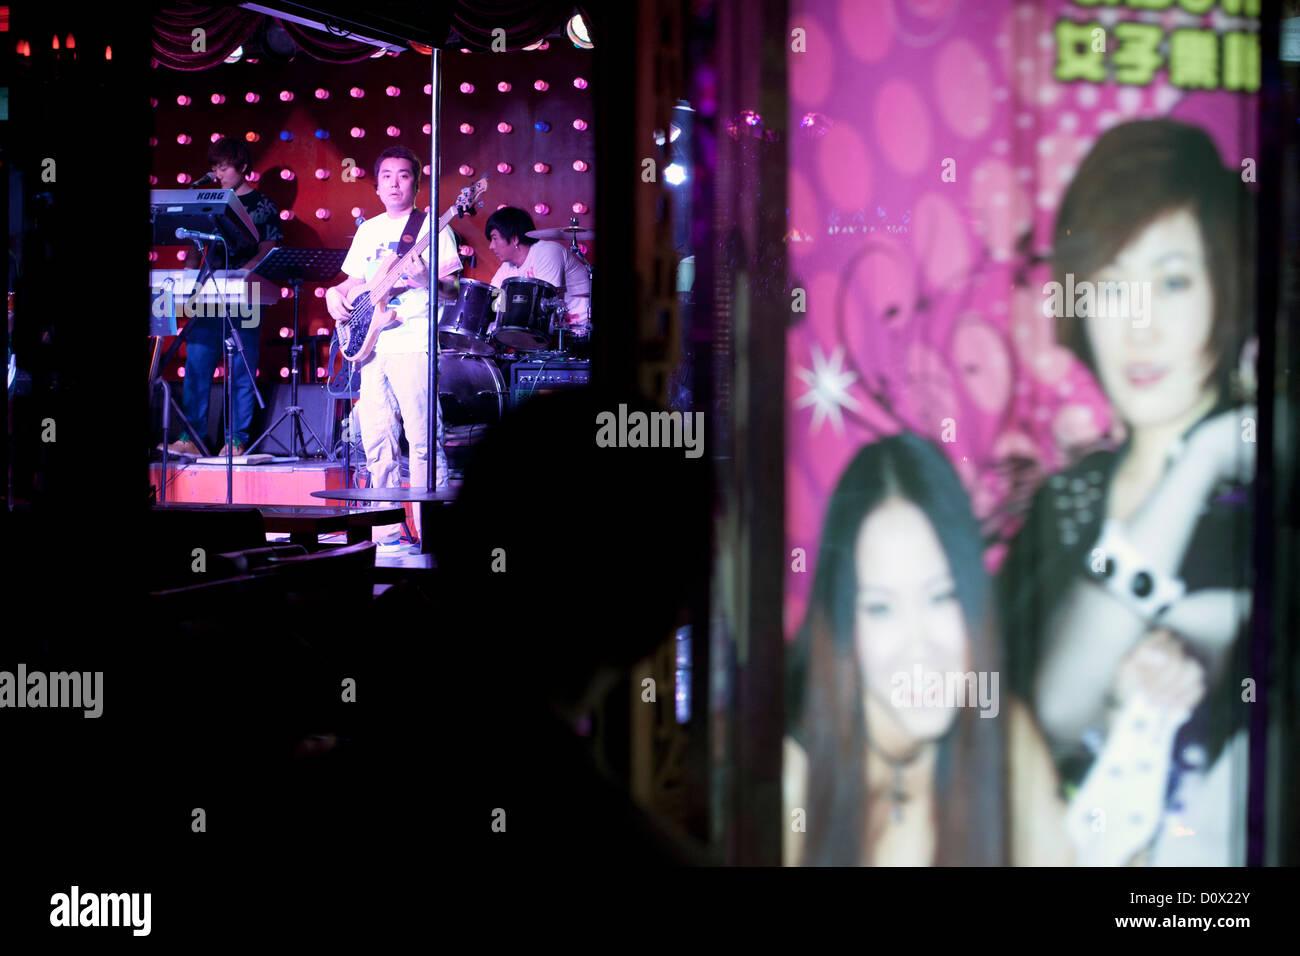 A musician playing guitar in a waterside bar on Shichahai Street (Lotus Market), Beijing, China. - Stock Image